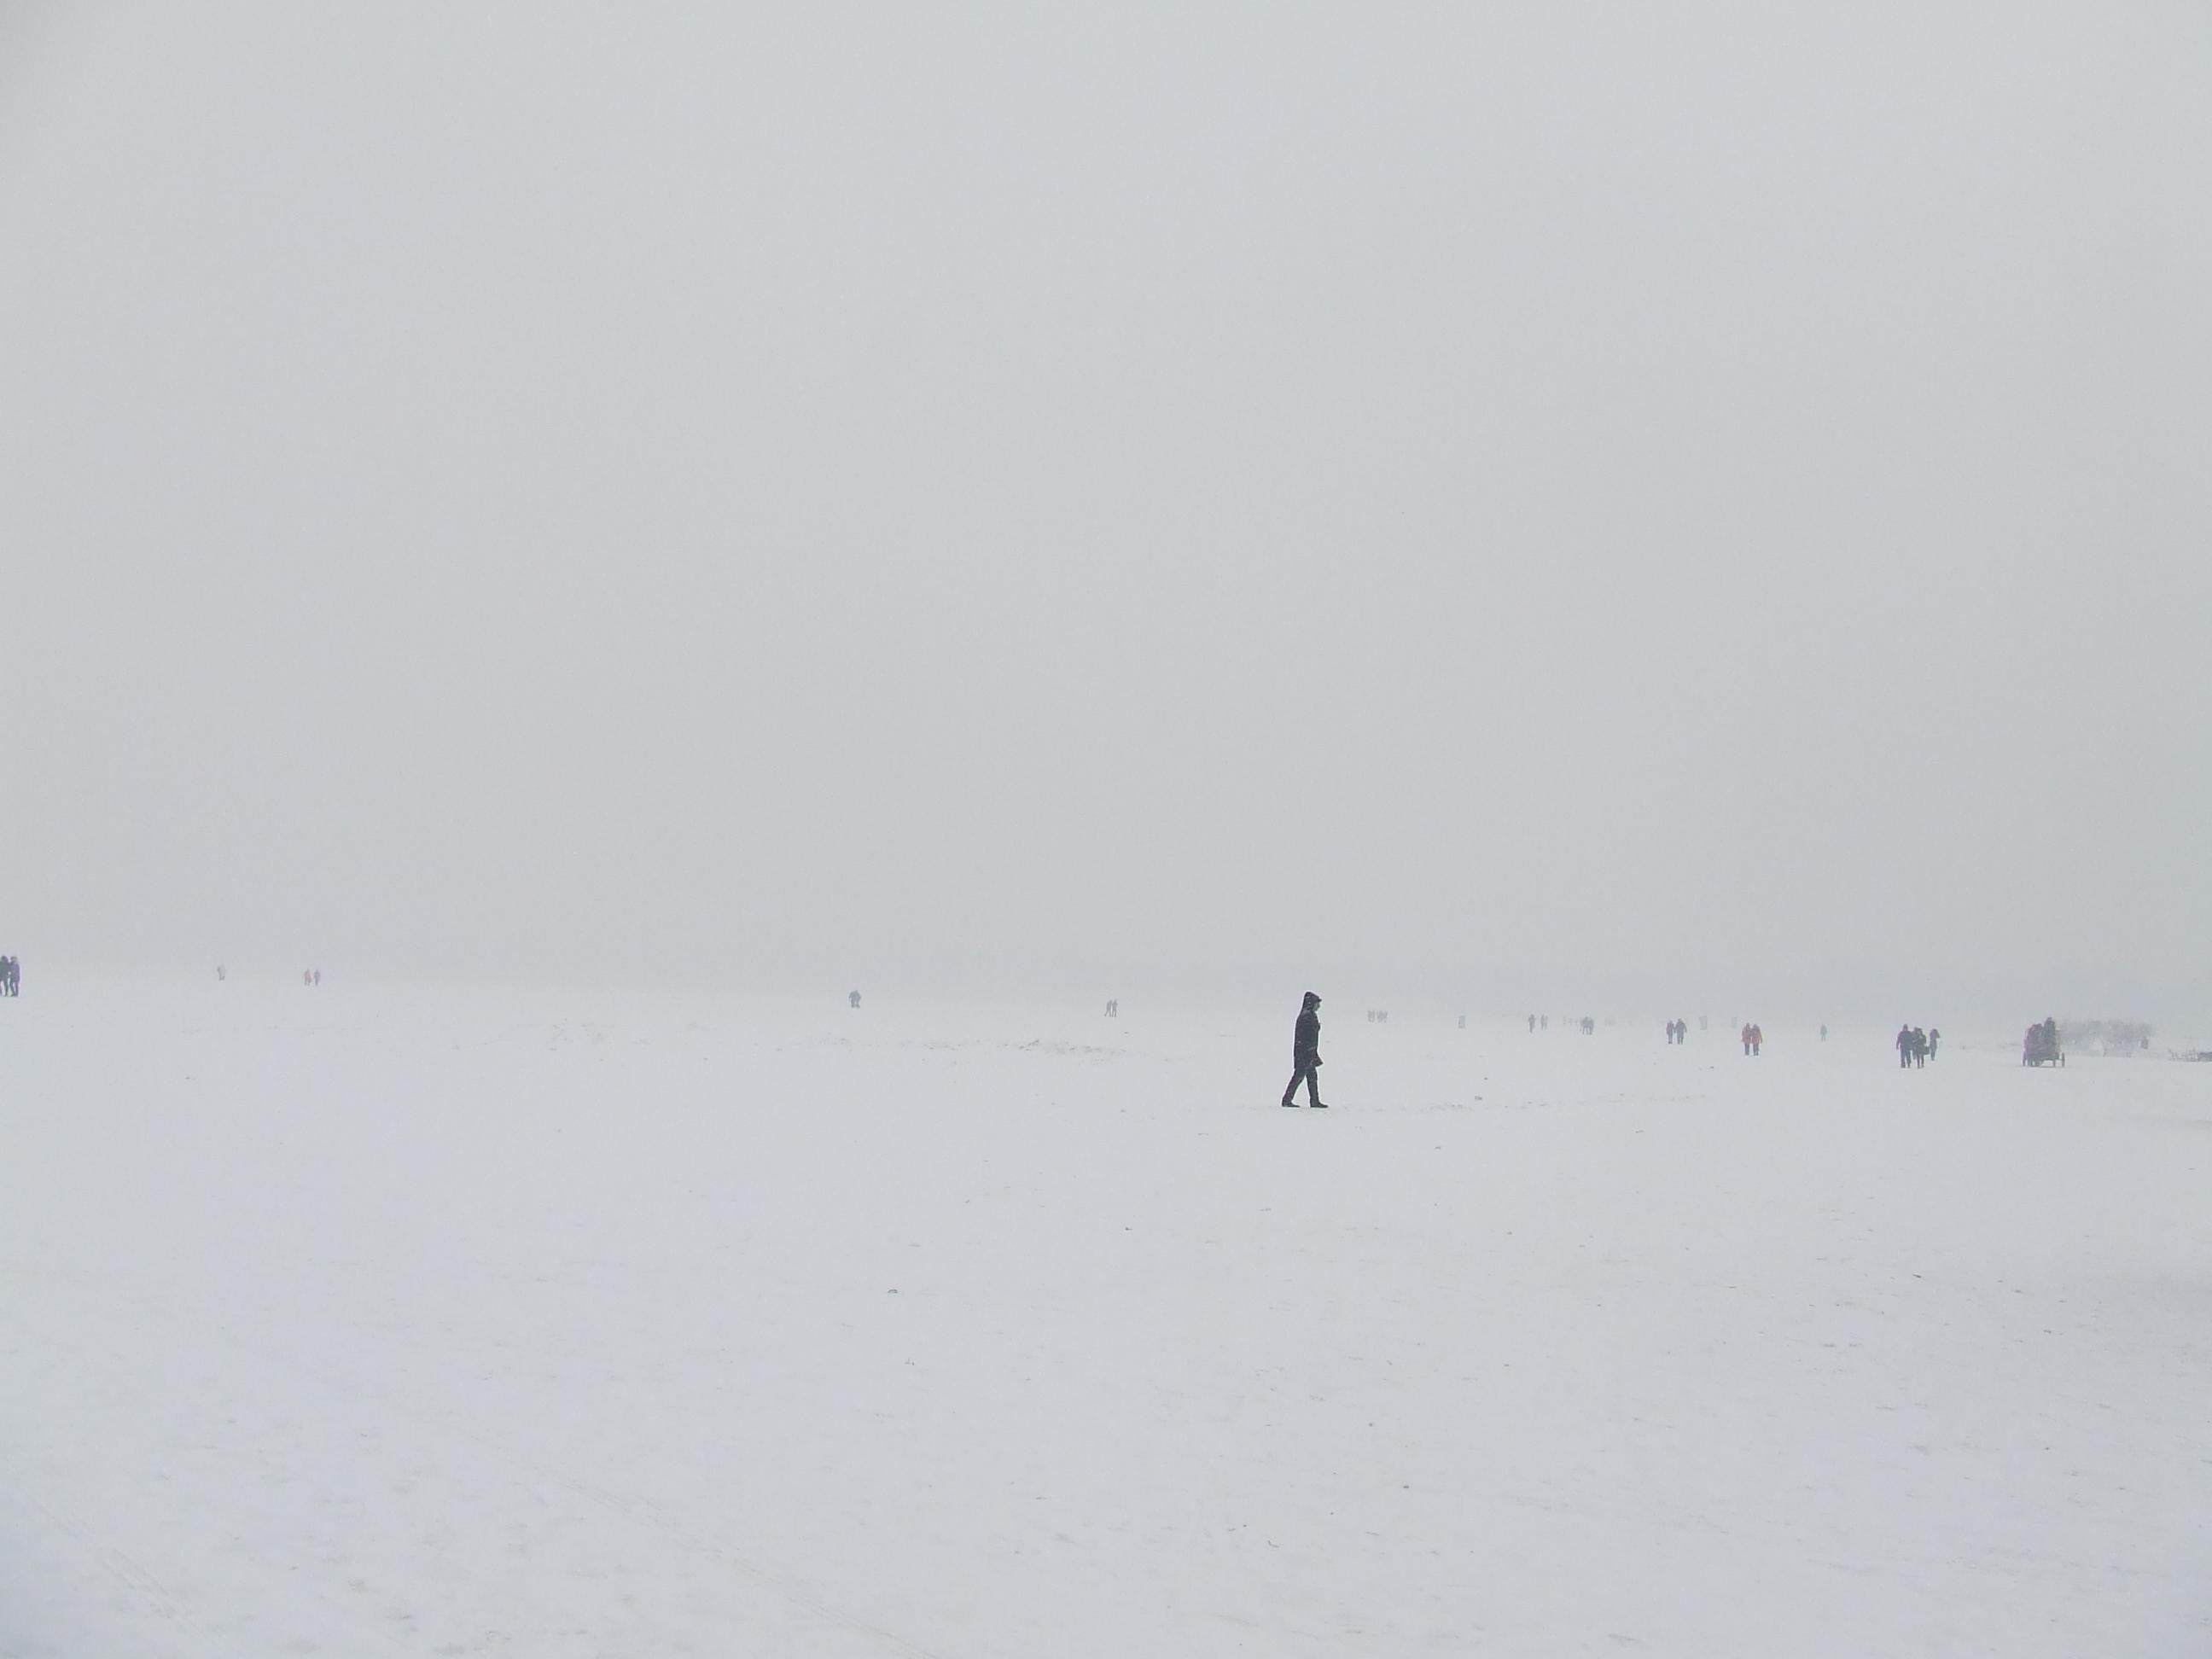 אגם קפוא, חרבין